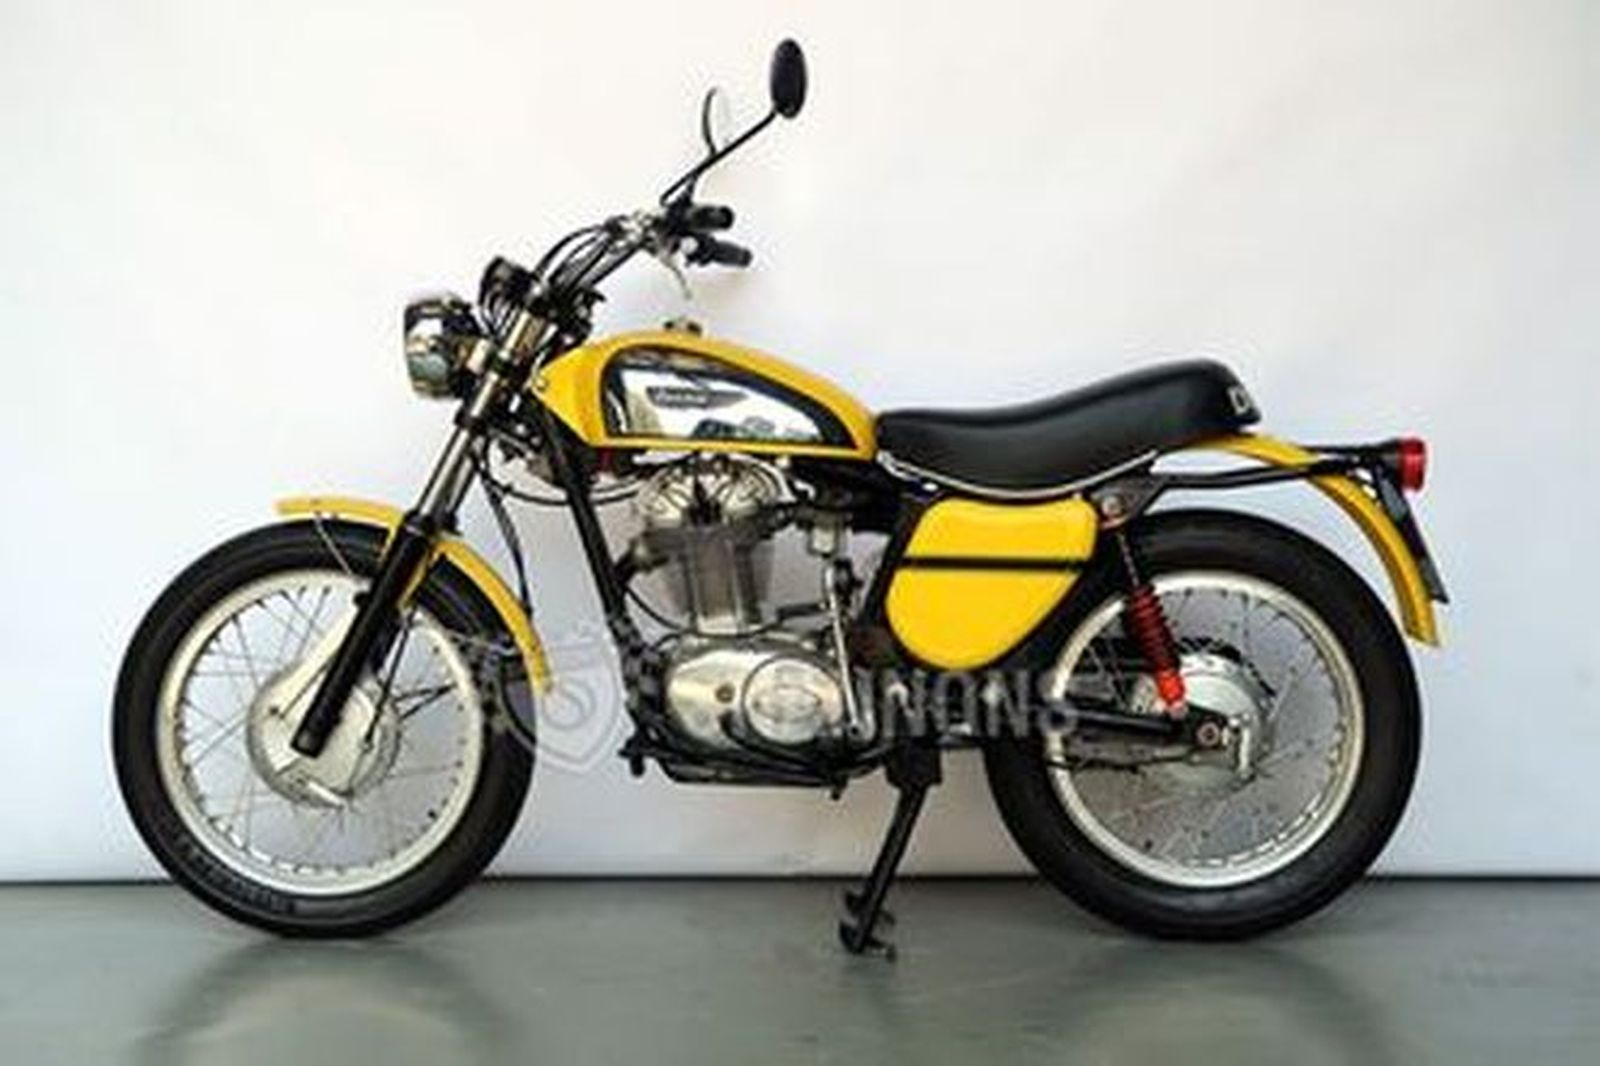 Ducati 450 Scrambler Motorcycle